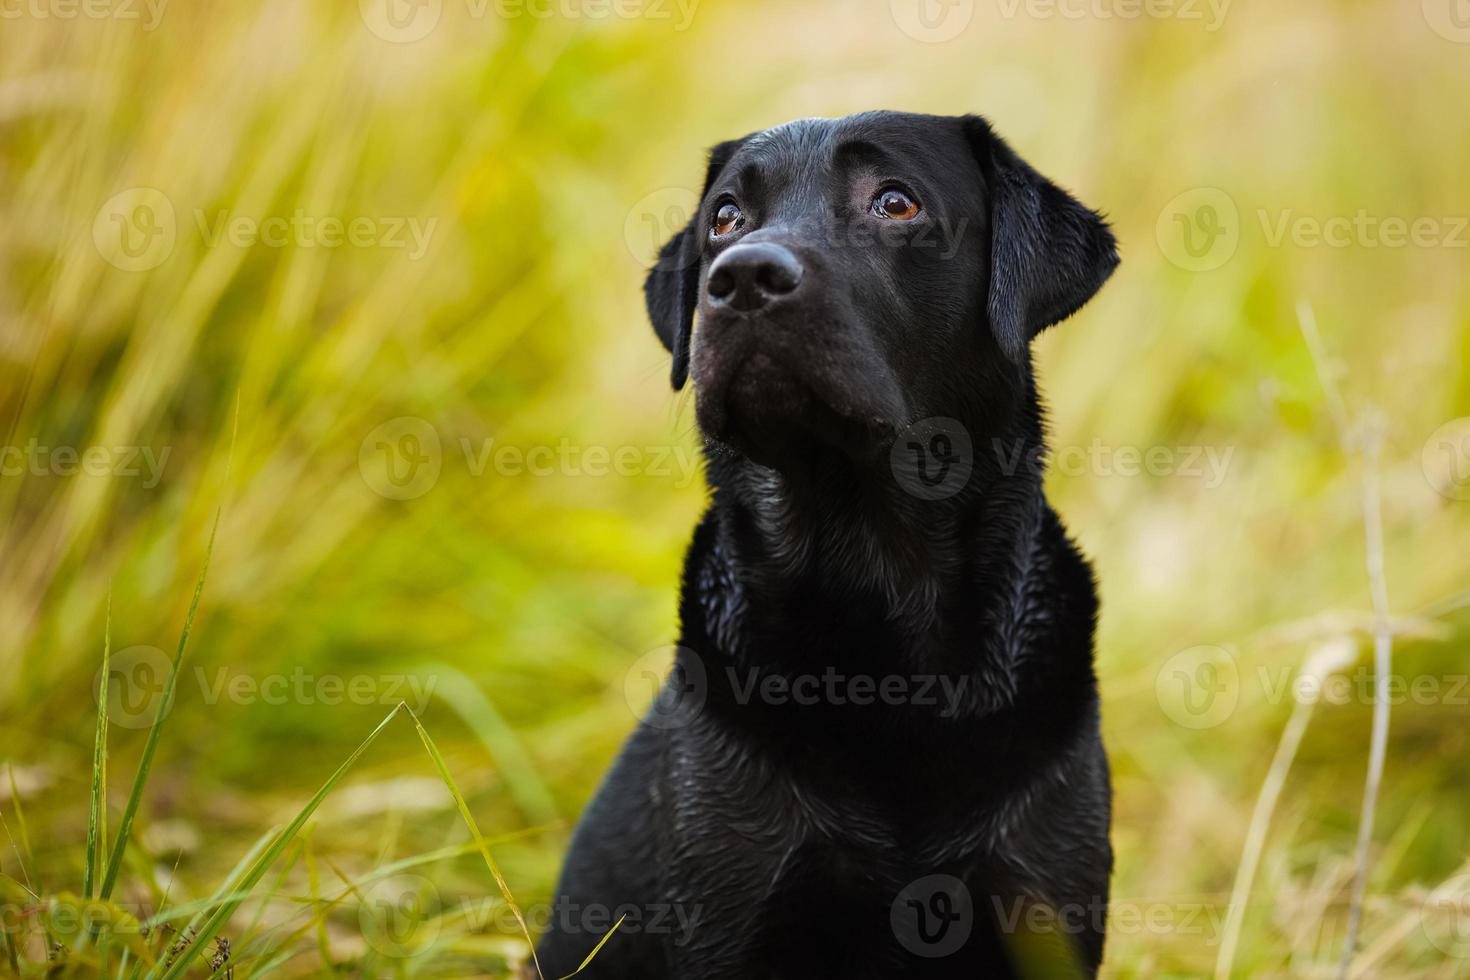 le labrador regarde son maître d'un air coupable photo